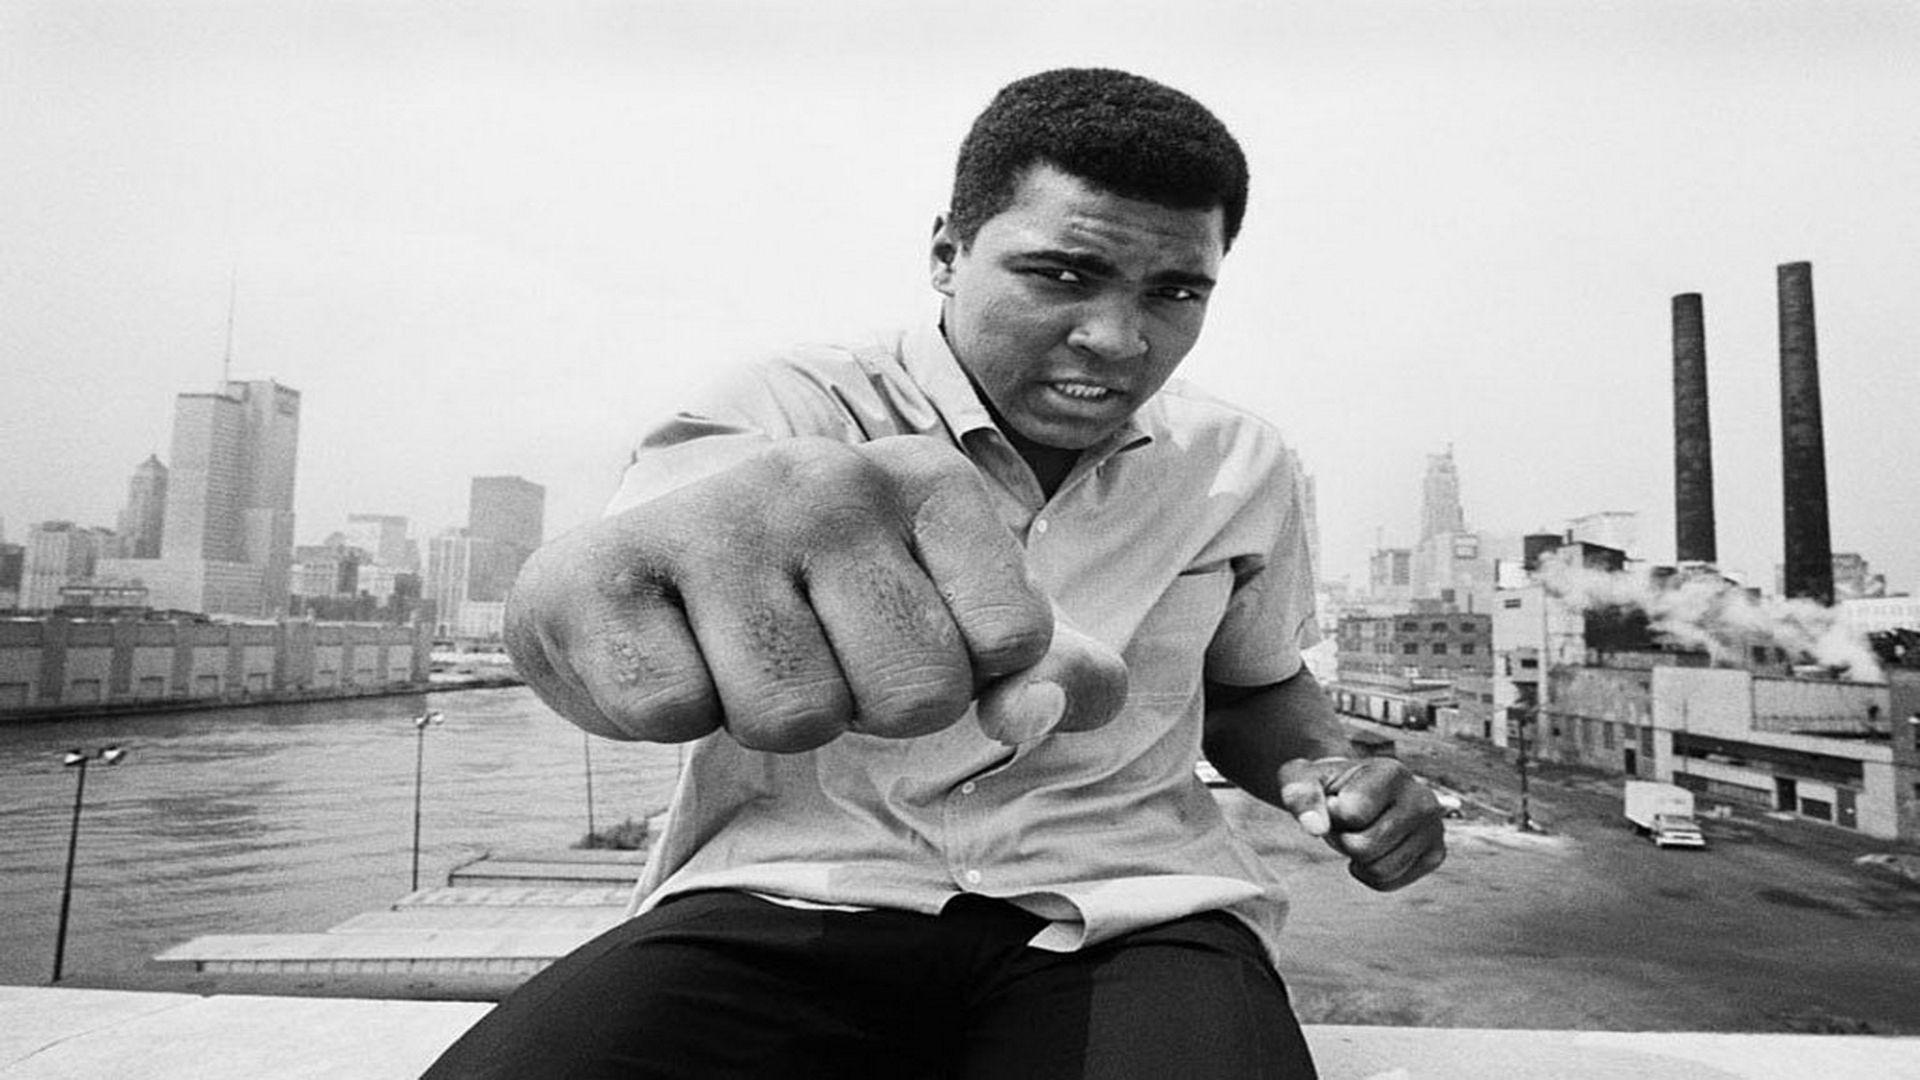 Inspirational Quotes Hd Wallpapers Free Download Muhammad Ali Hd Backgrounds Pixelstalk Net